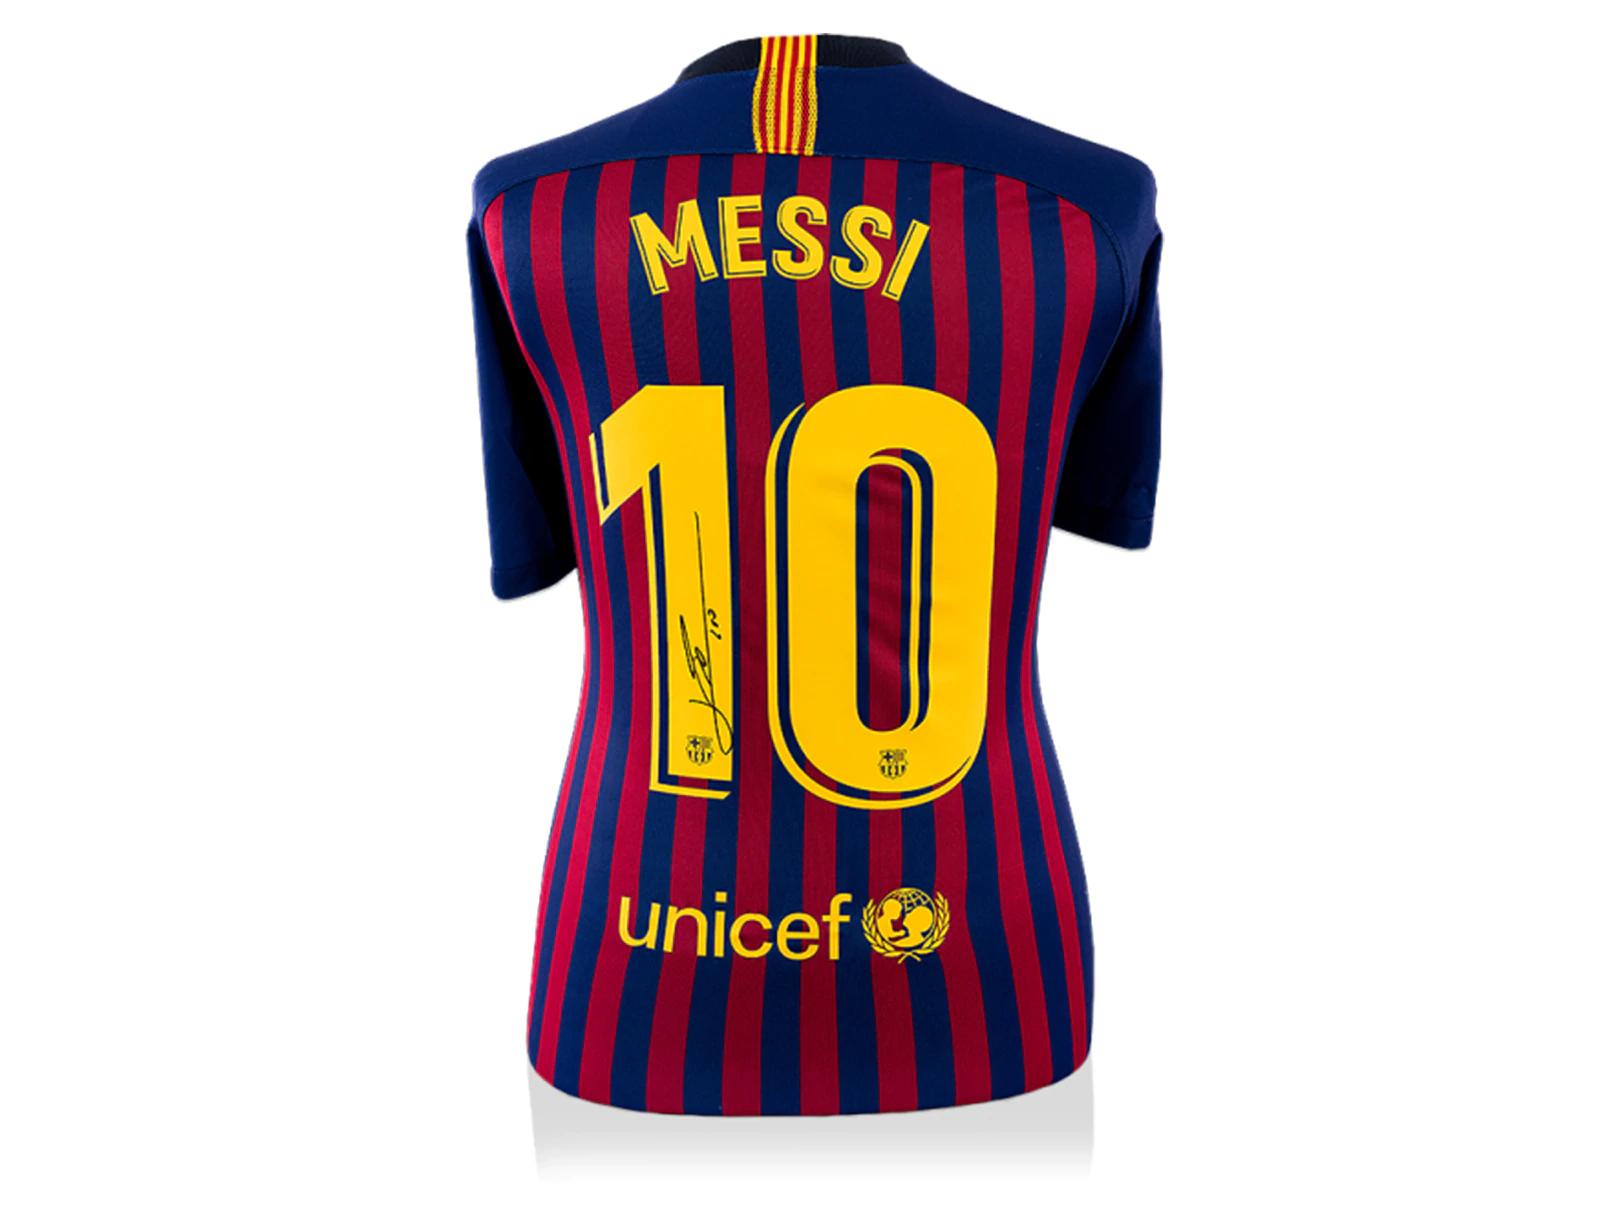 Playera autografiada por Leonel Messi